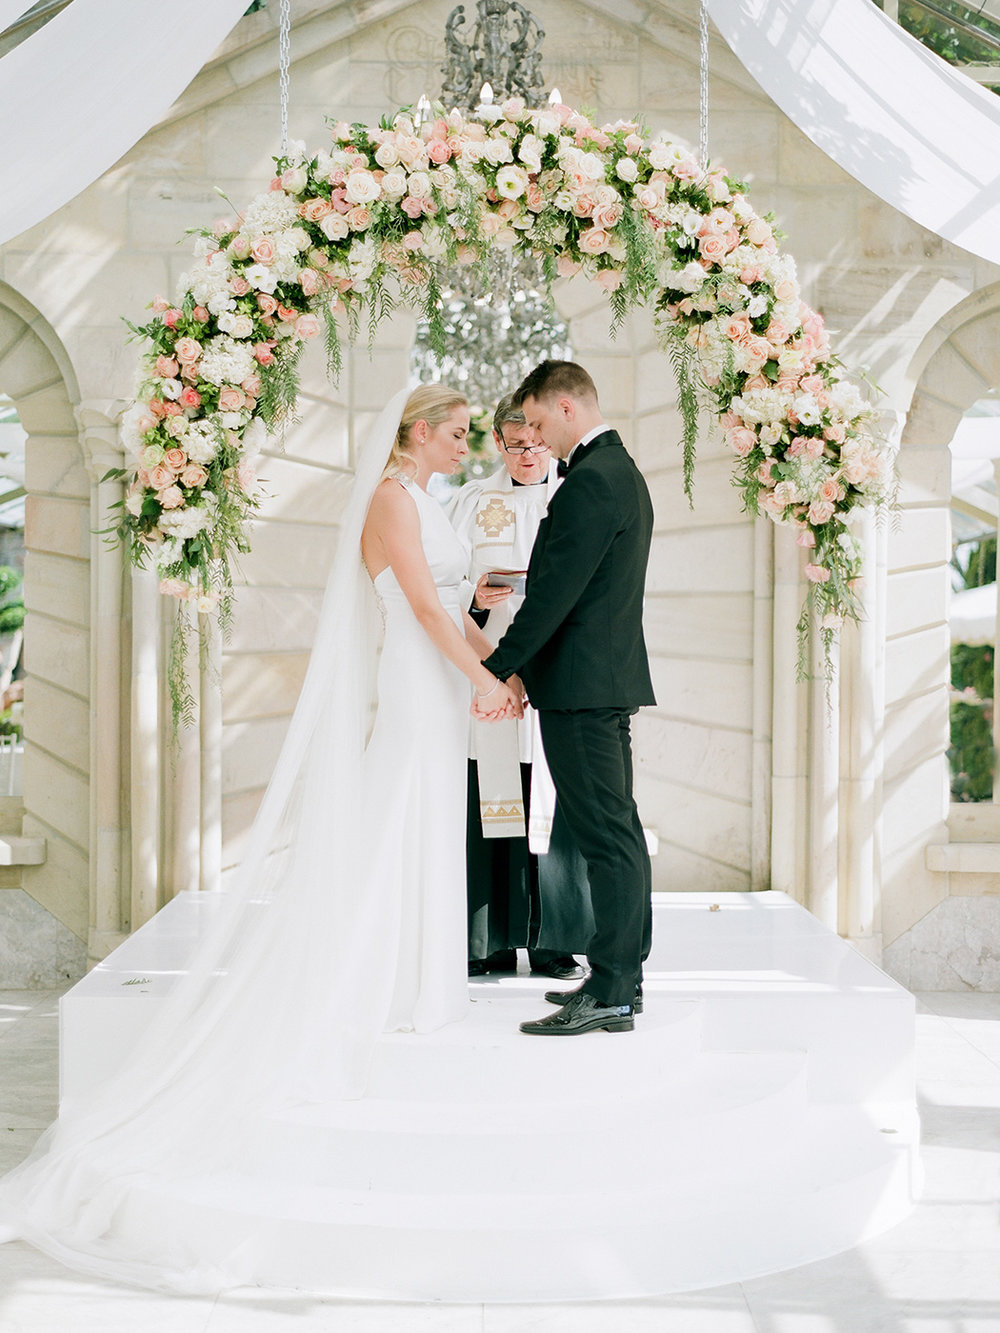 Wedding Ceremony | Rensche Mari Photography